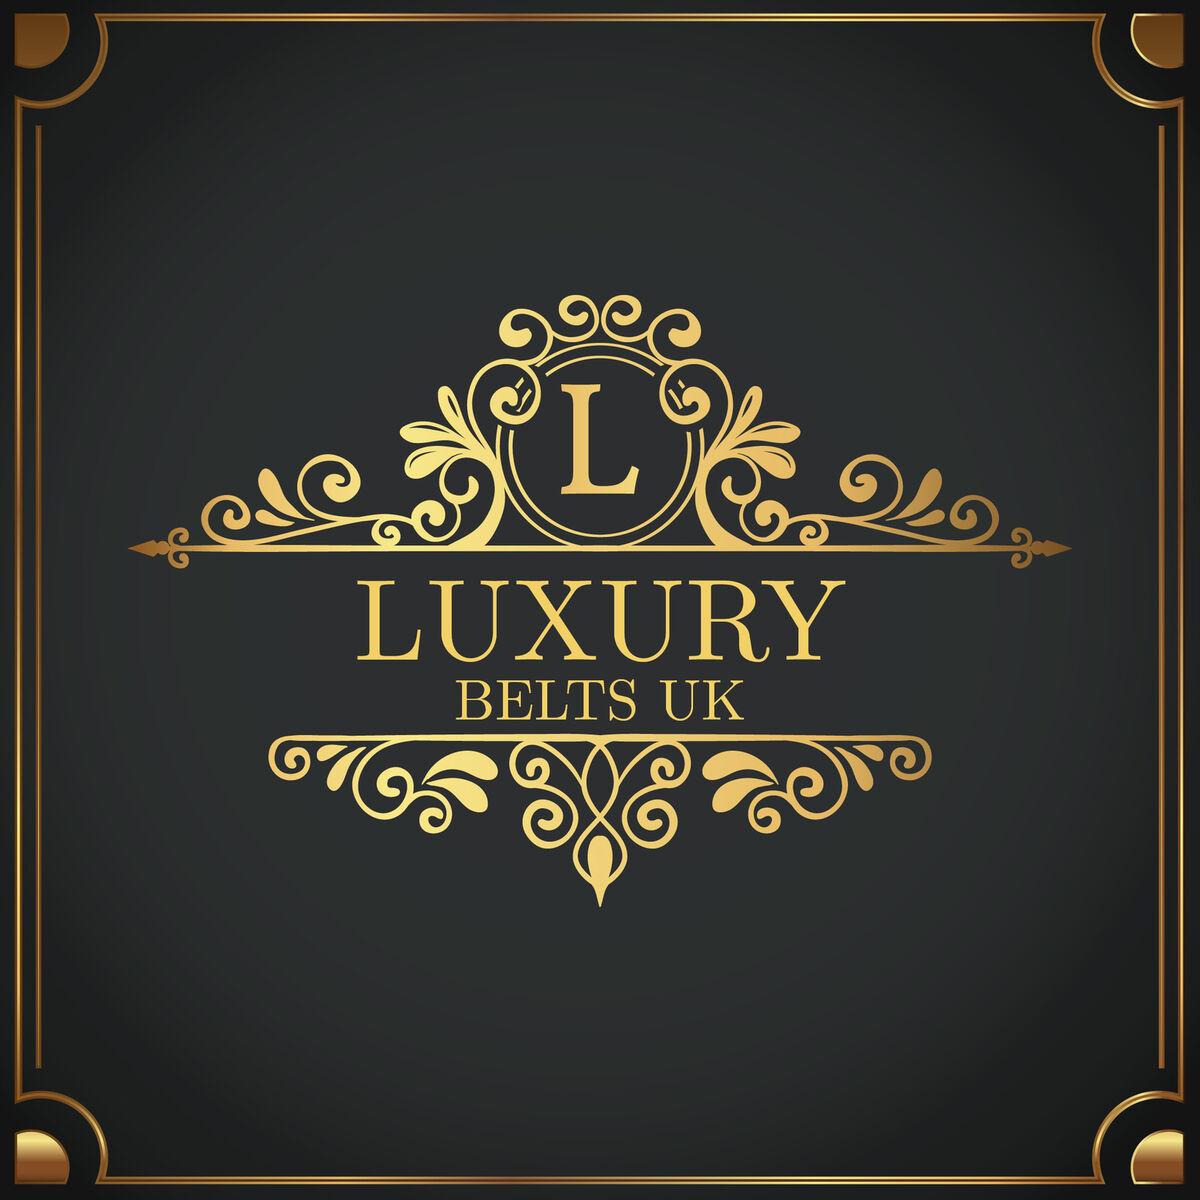 luxurybeltsuk